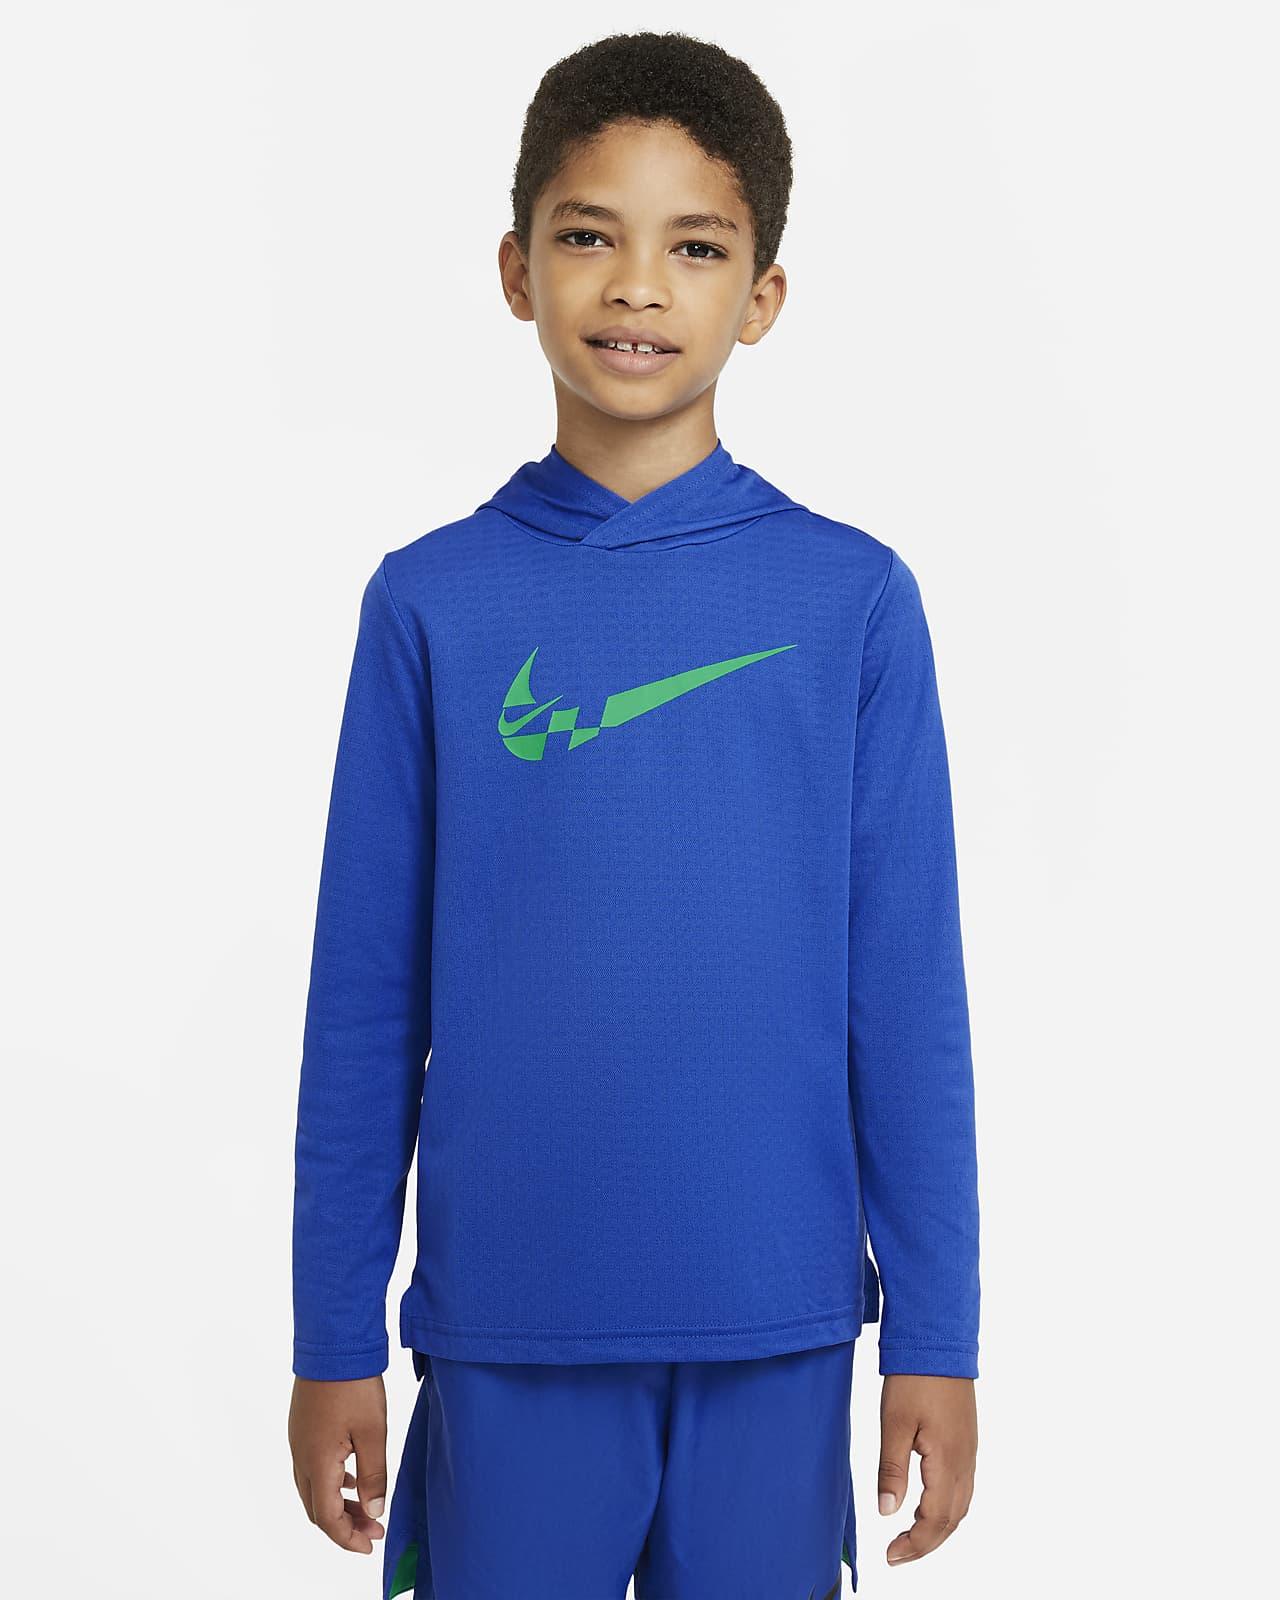 Nike Big Kids' (Boys') Long-Sleeve Hooded Training Top